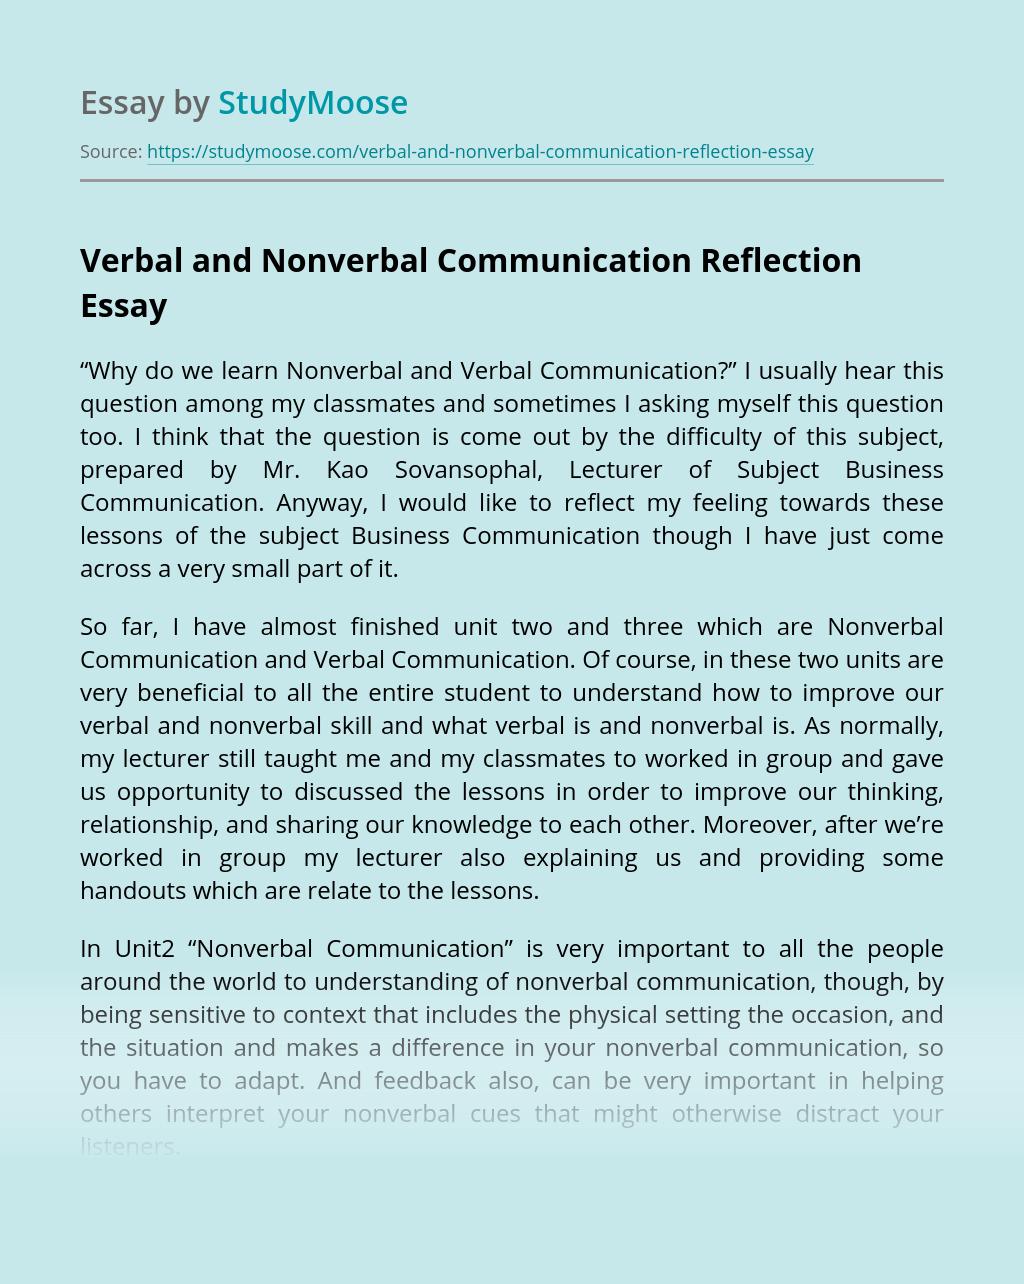 Verbal and Nonverbal Communication Reflection